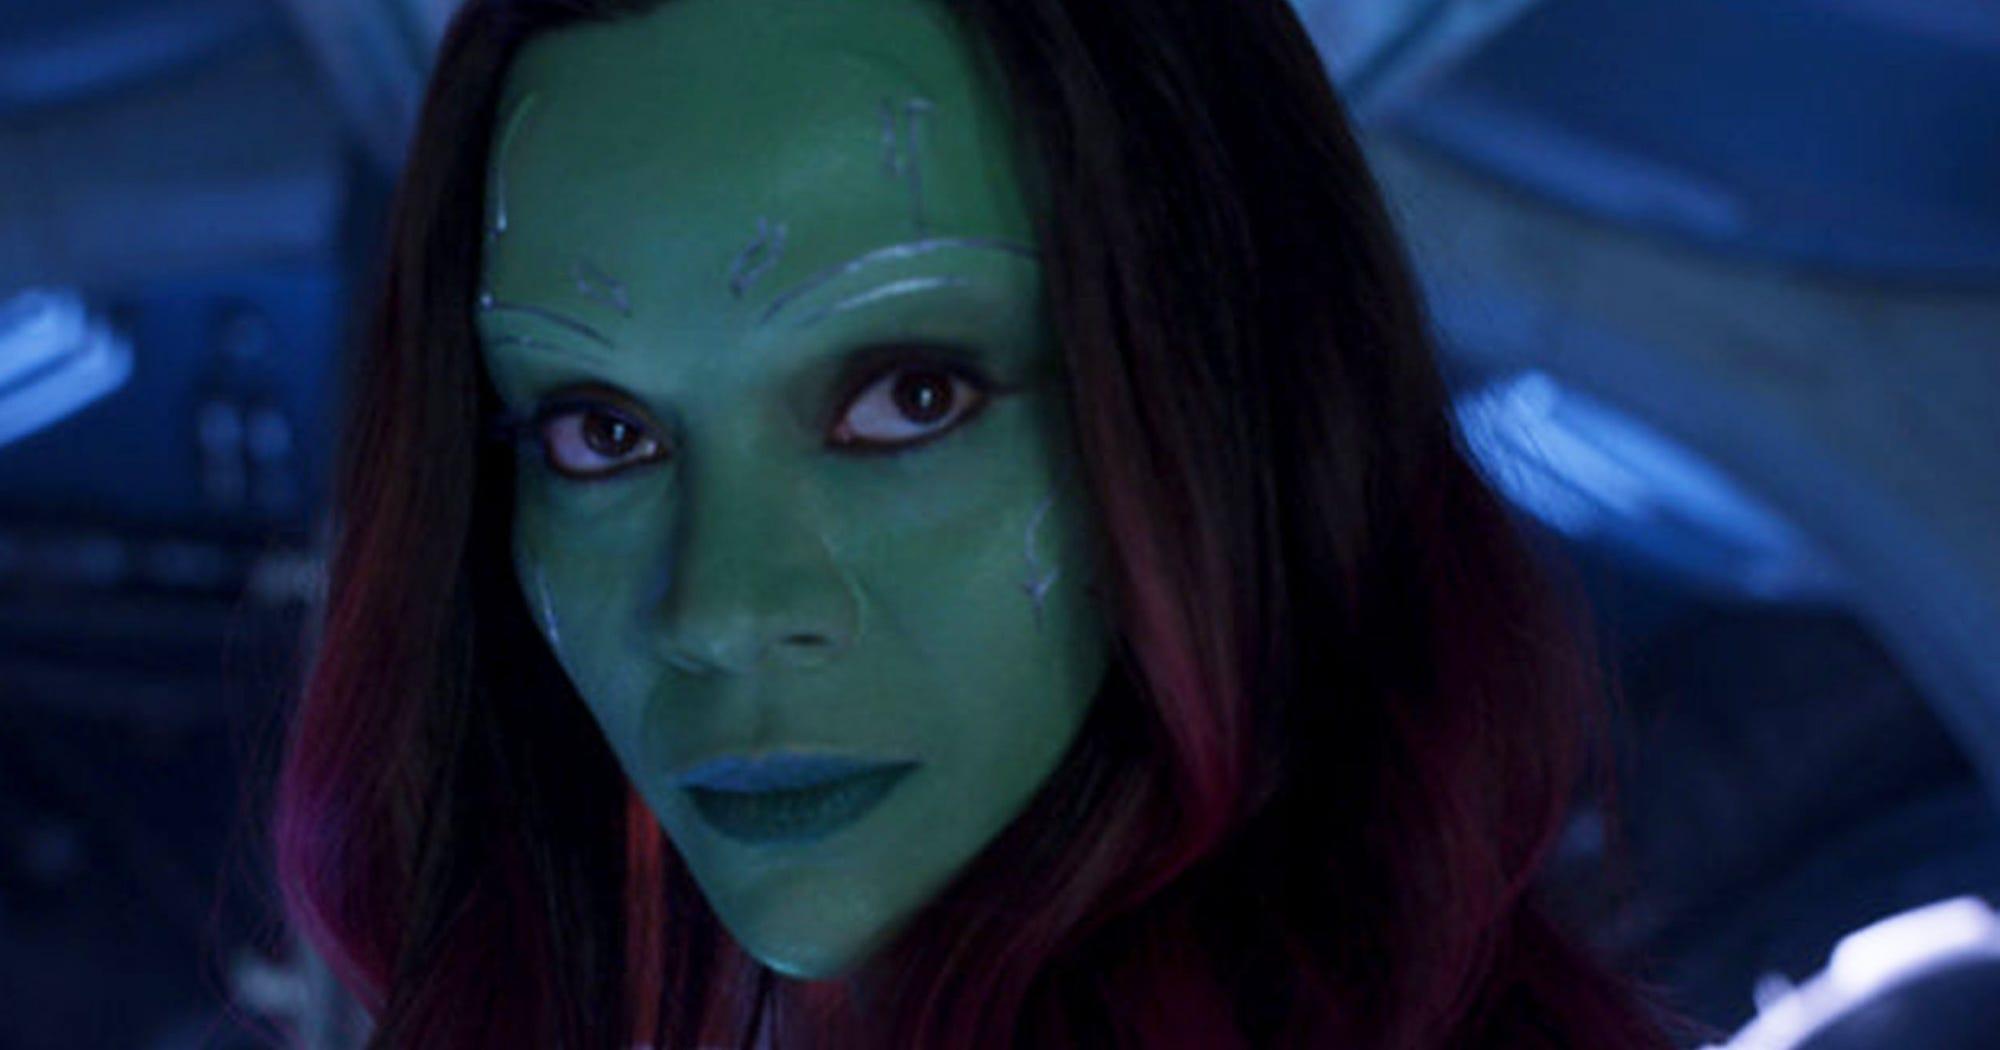 Guardians of the Galaxy: Who Is Gamora? |Gamora Guardians Of The Galaxy Trailer